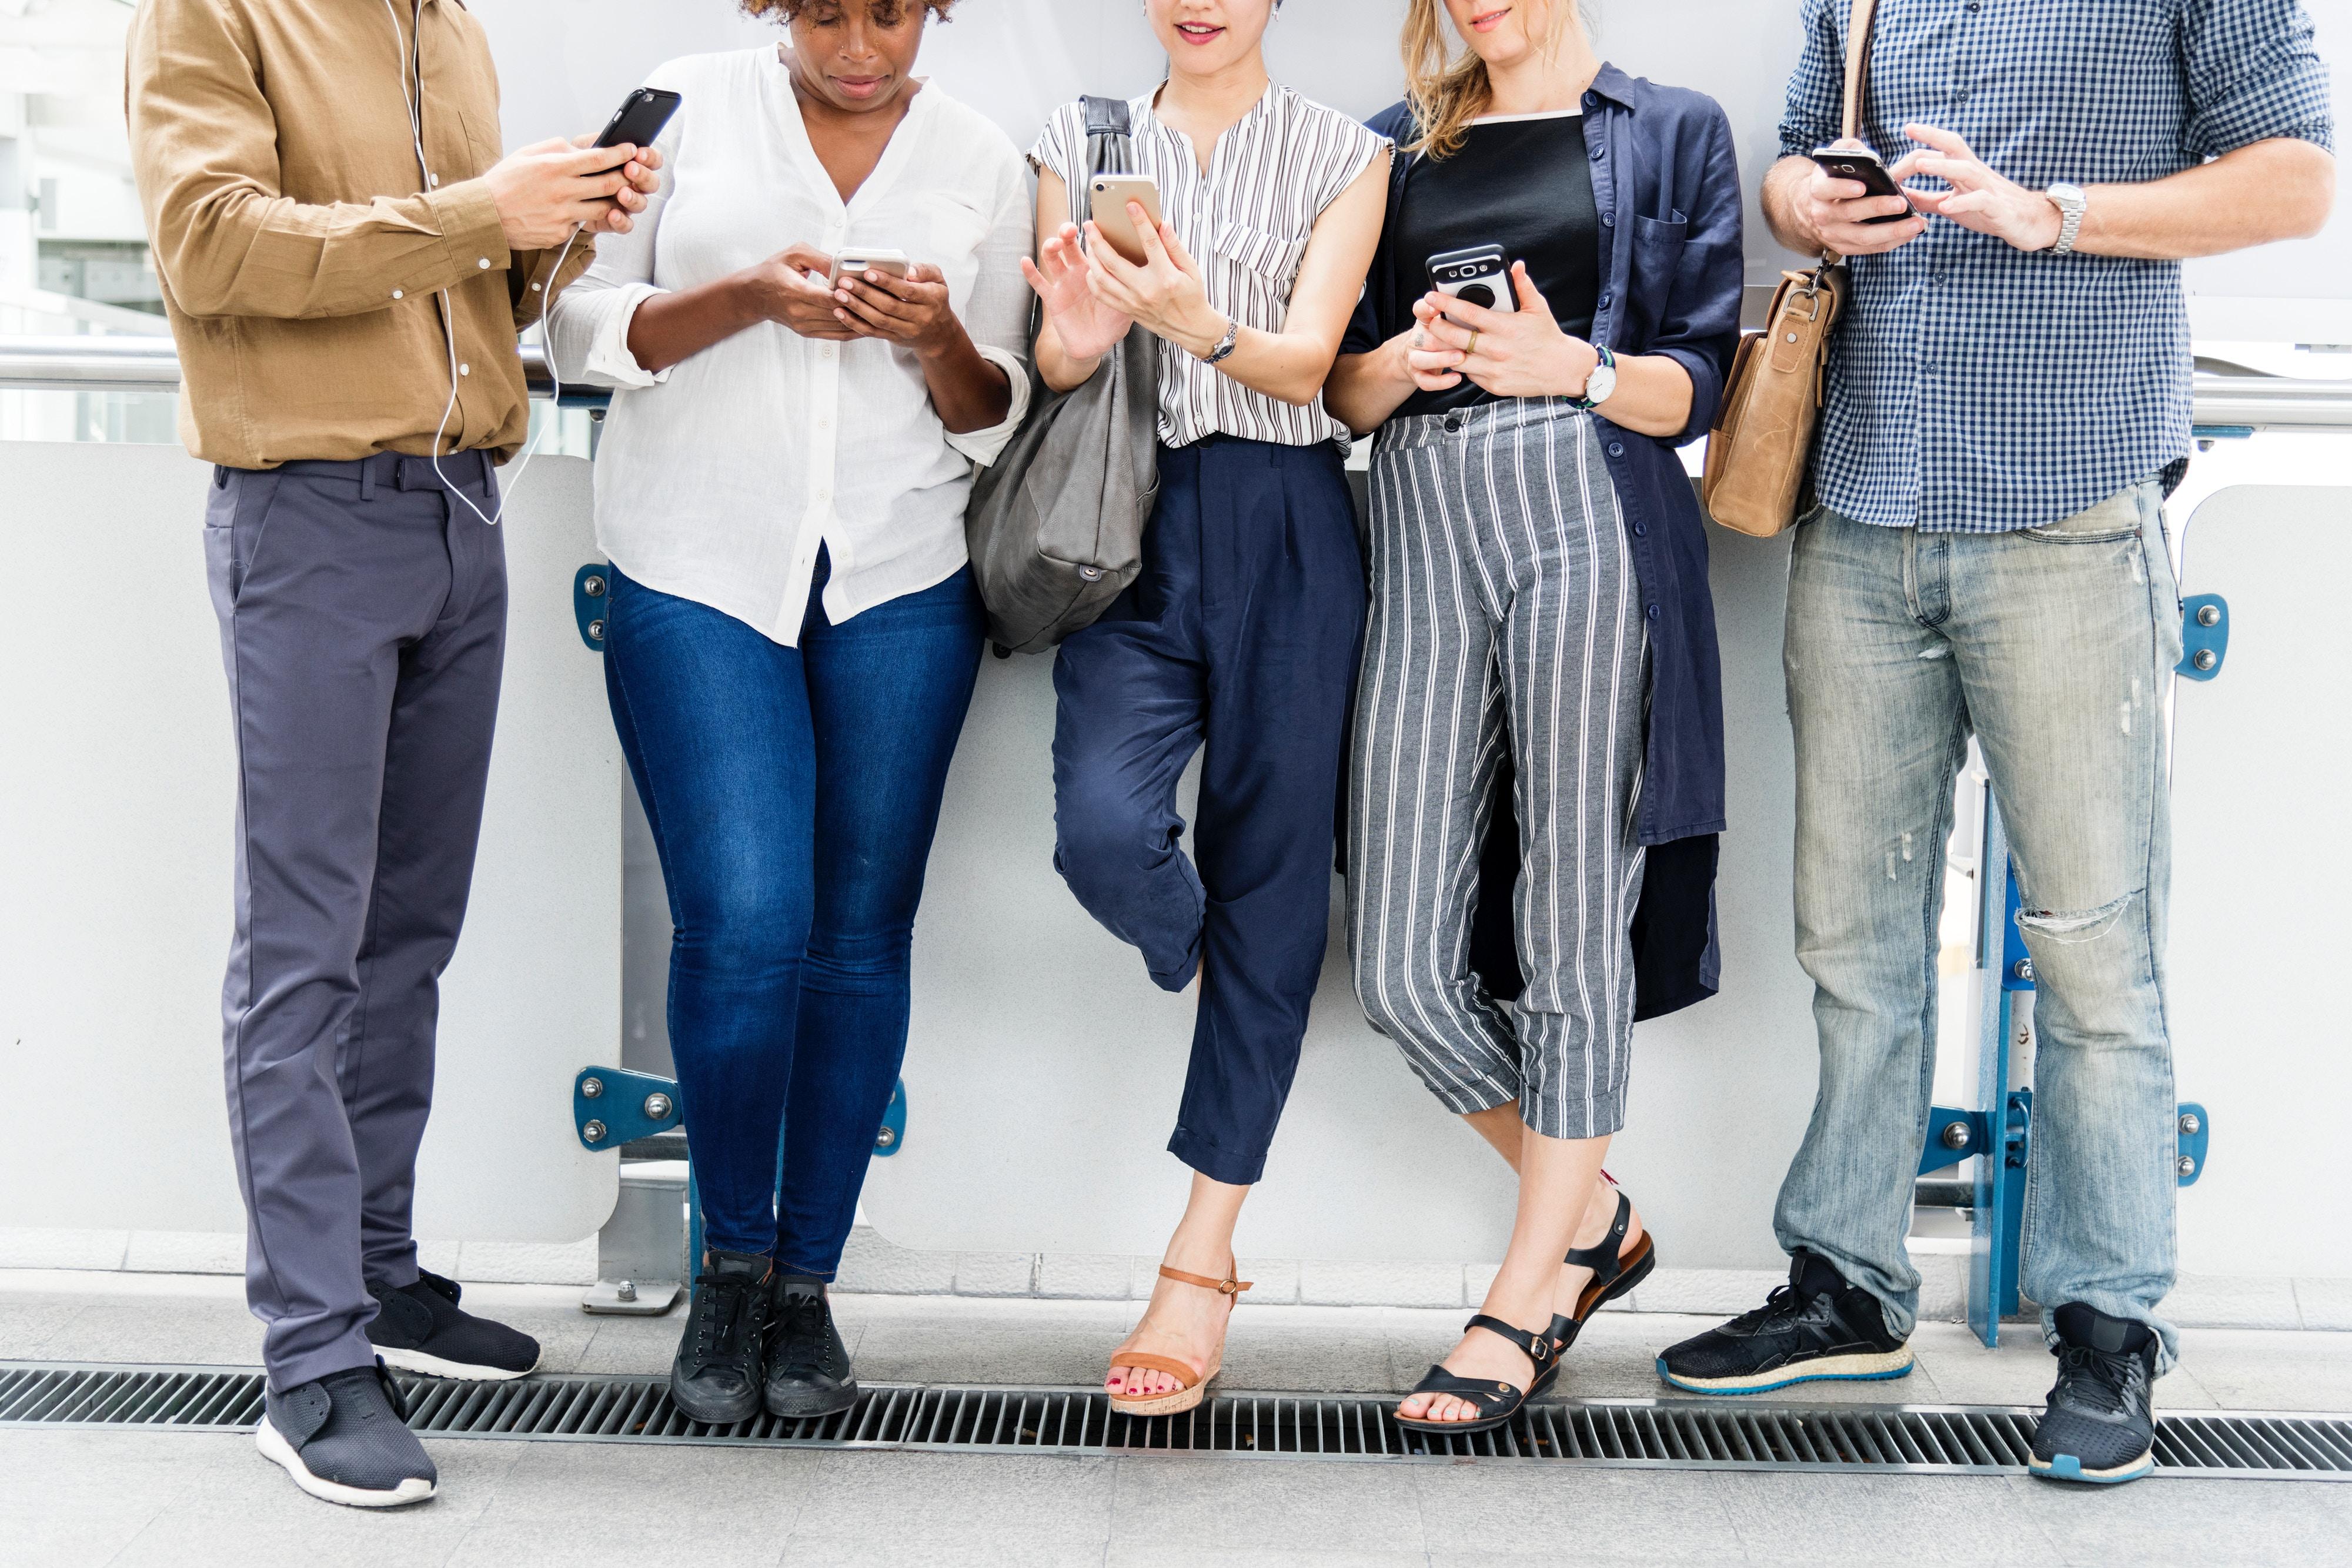 5 Reasons Why You Need an Organic Social Media Strategy